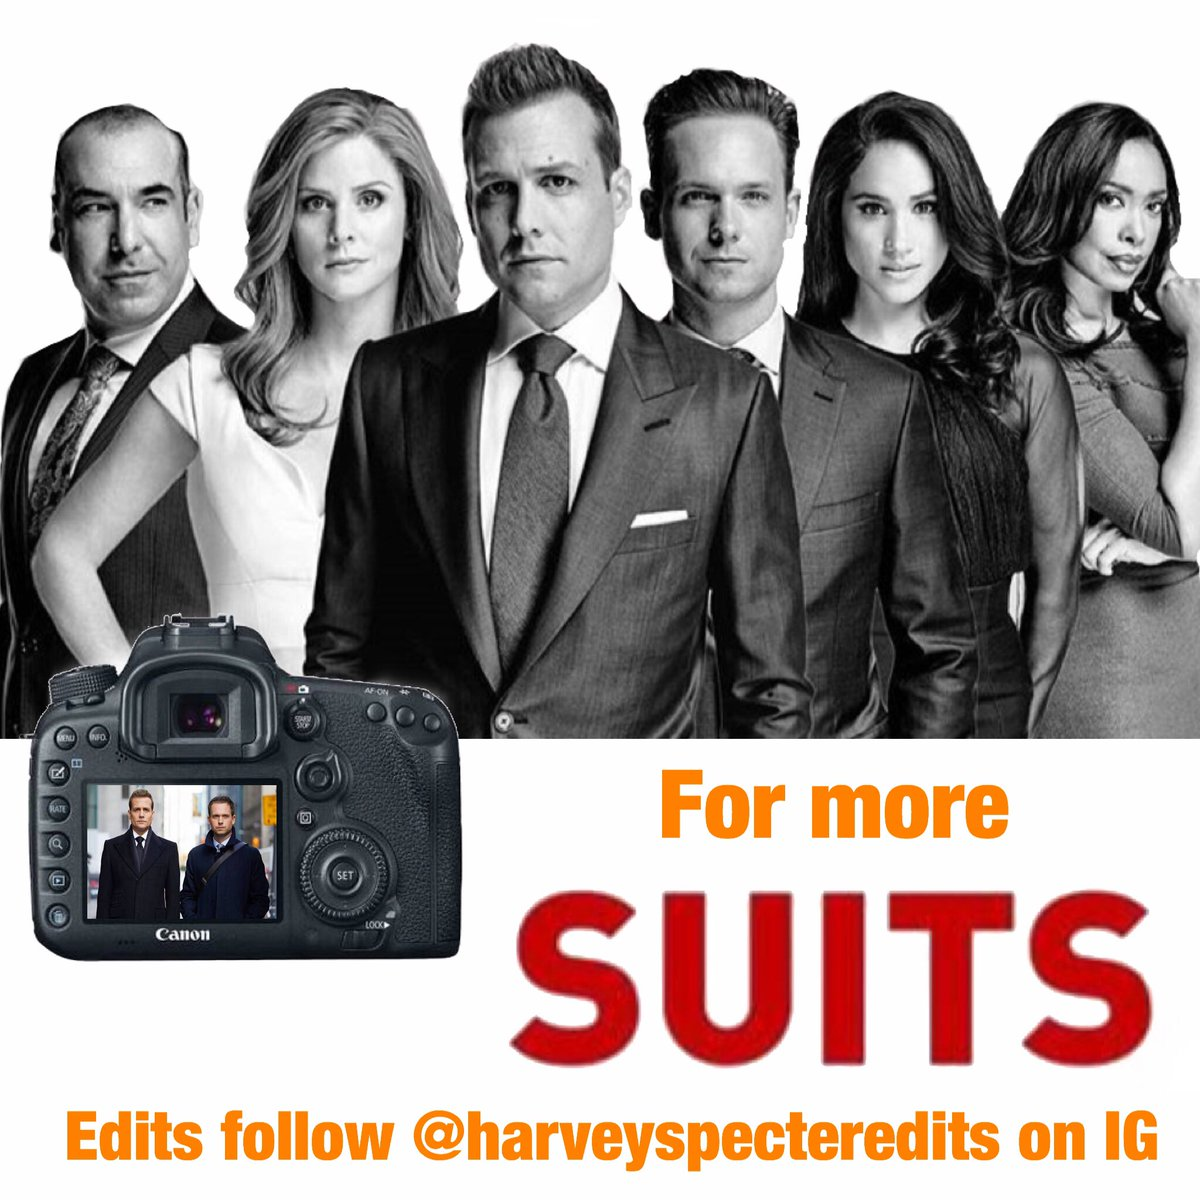 Go follow my #harveyspecter account on instagram! @harveyspecteredits <br>http://pic.twitter.com/w4dXw7aqCU